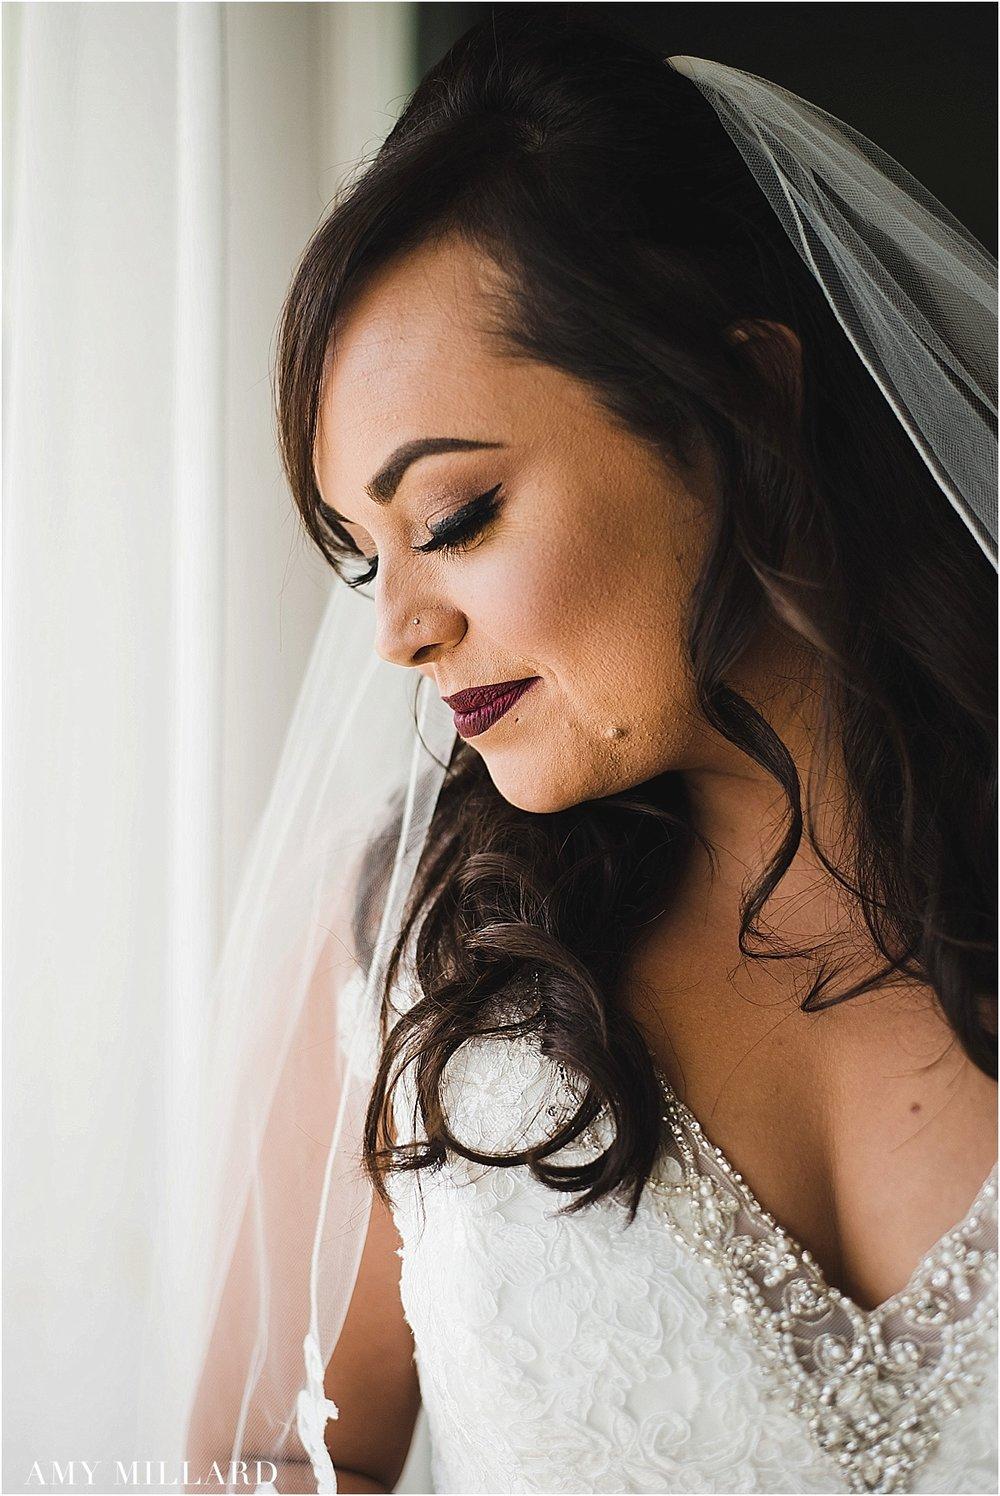 Amy Millard Wedding Photographer_0090.jpg